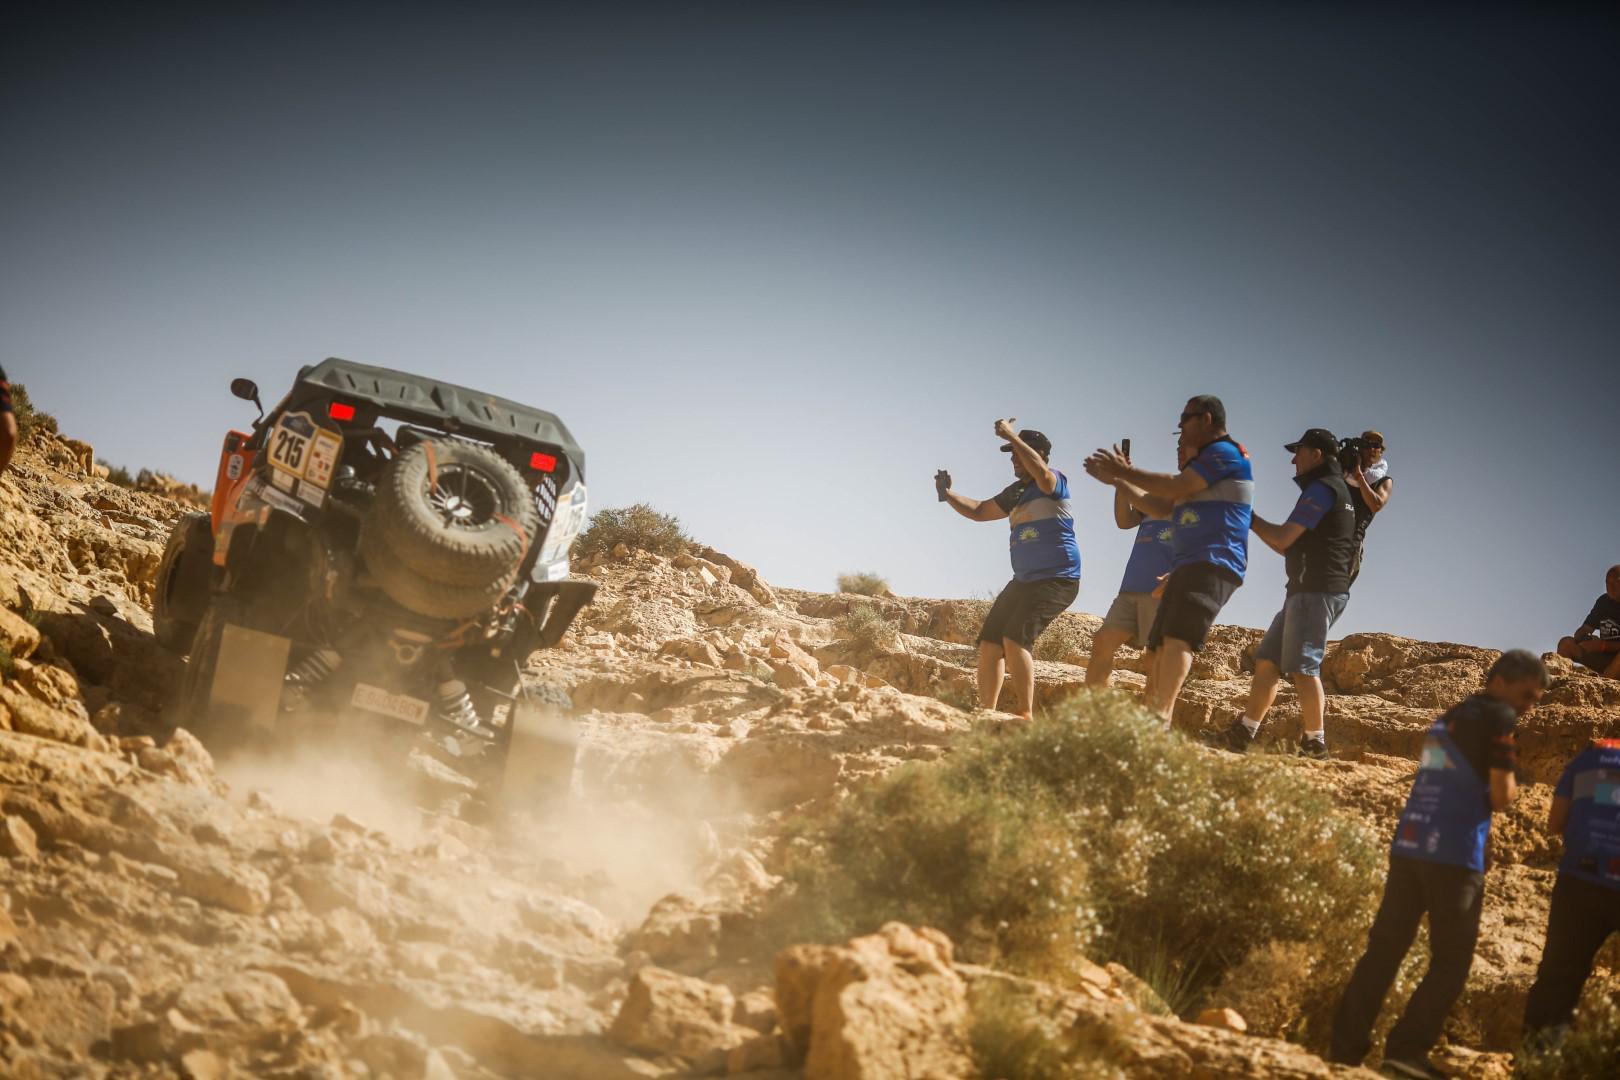 afriquia-merzouga-rally-la-surprise-botturi-752-2.jpg